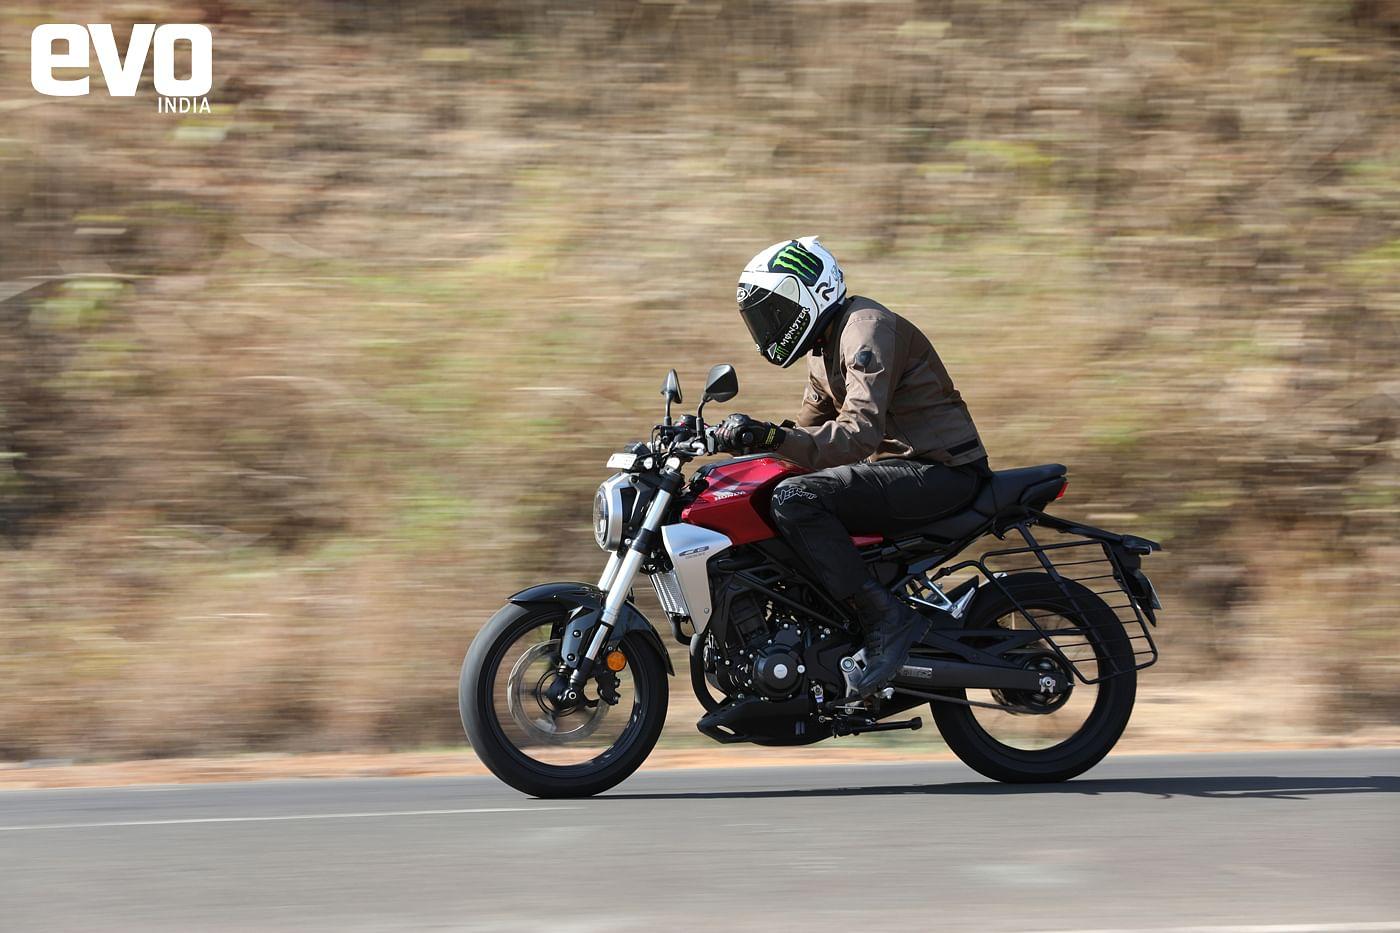 Honda CB300F naked motorcycle priced at USD 3,999 in USA